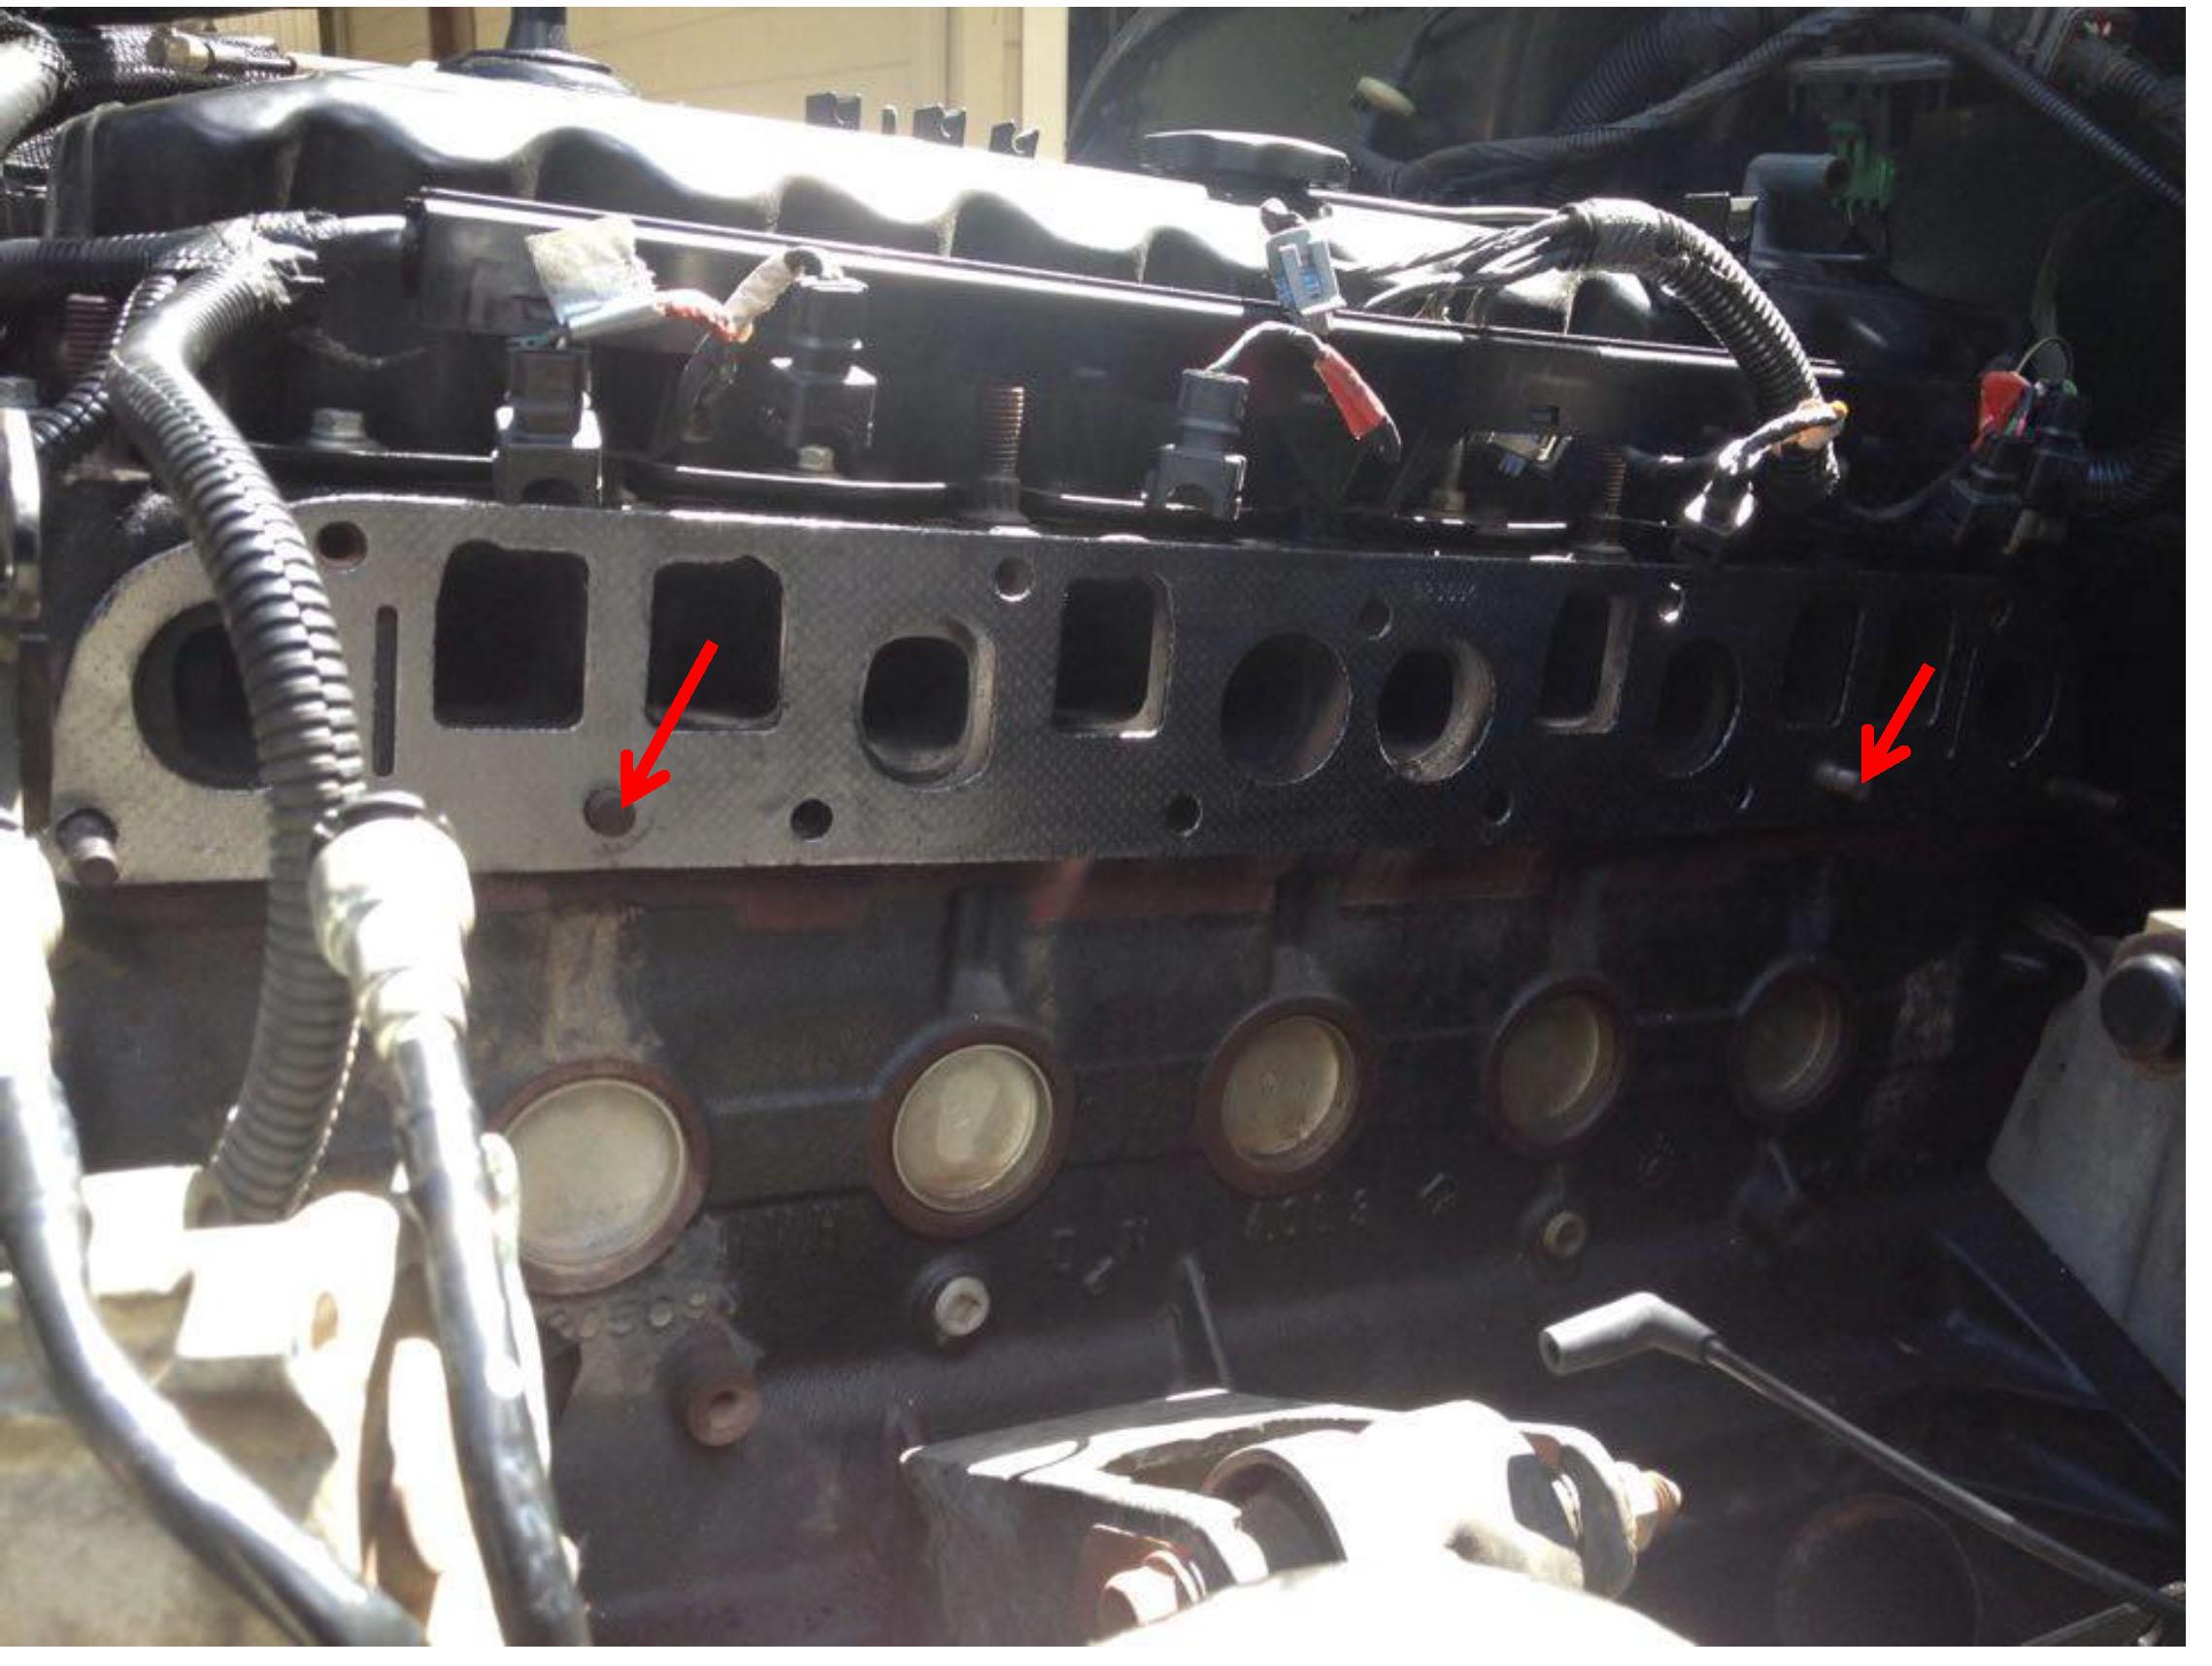 WRG-7265] Aftermarket Jeep 4 0 Cylinder Head on